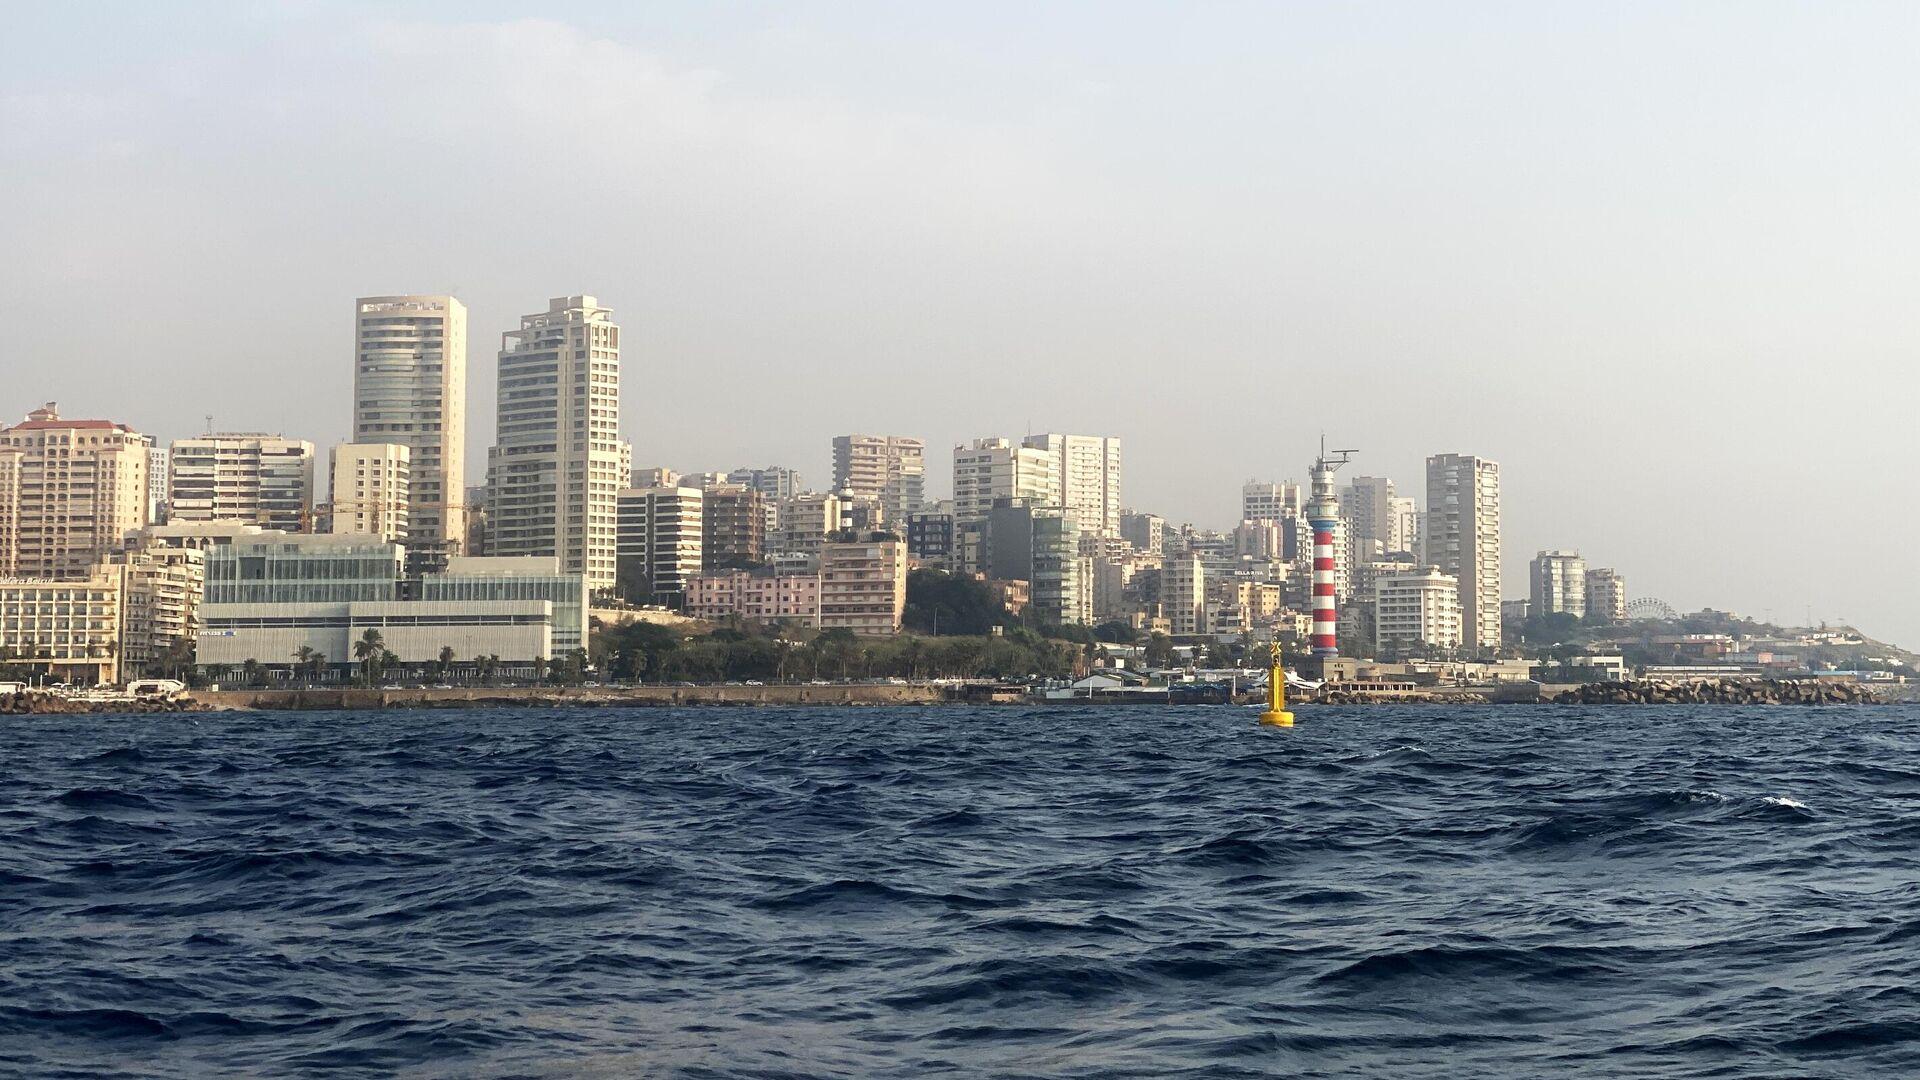 Вид на набережную Бейрута в районе маяка со стороны моря - РИА Новости, 1920, 04.05.2021